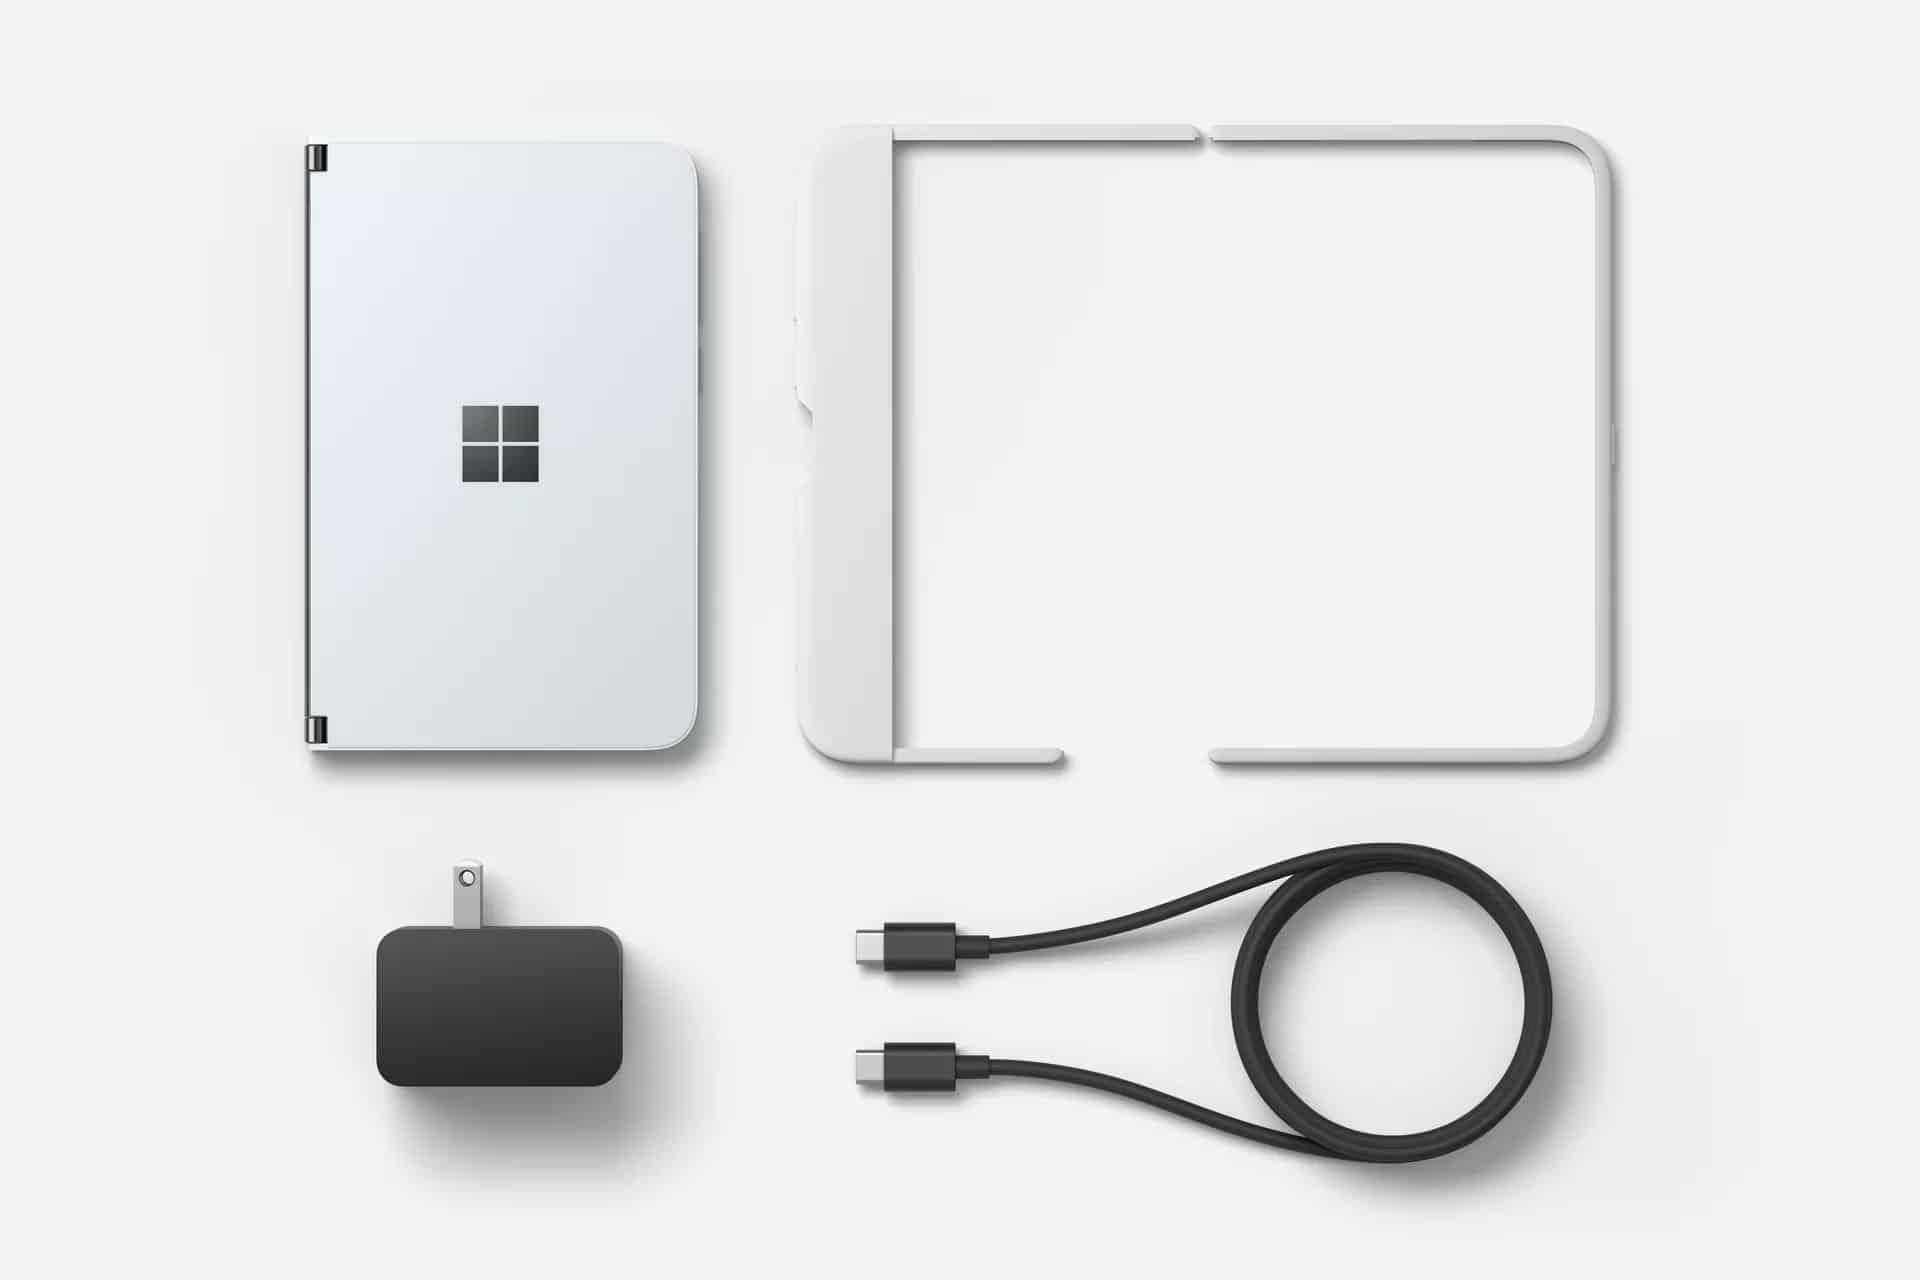 Microsoft Surface Duo image 2